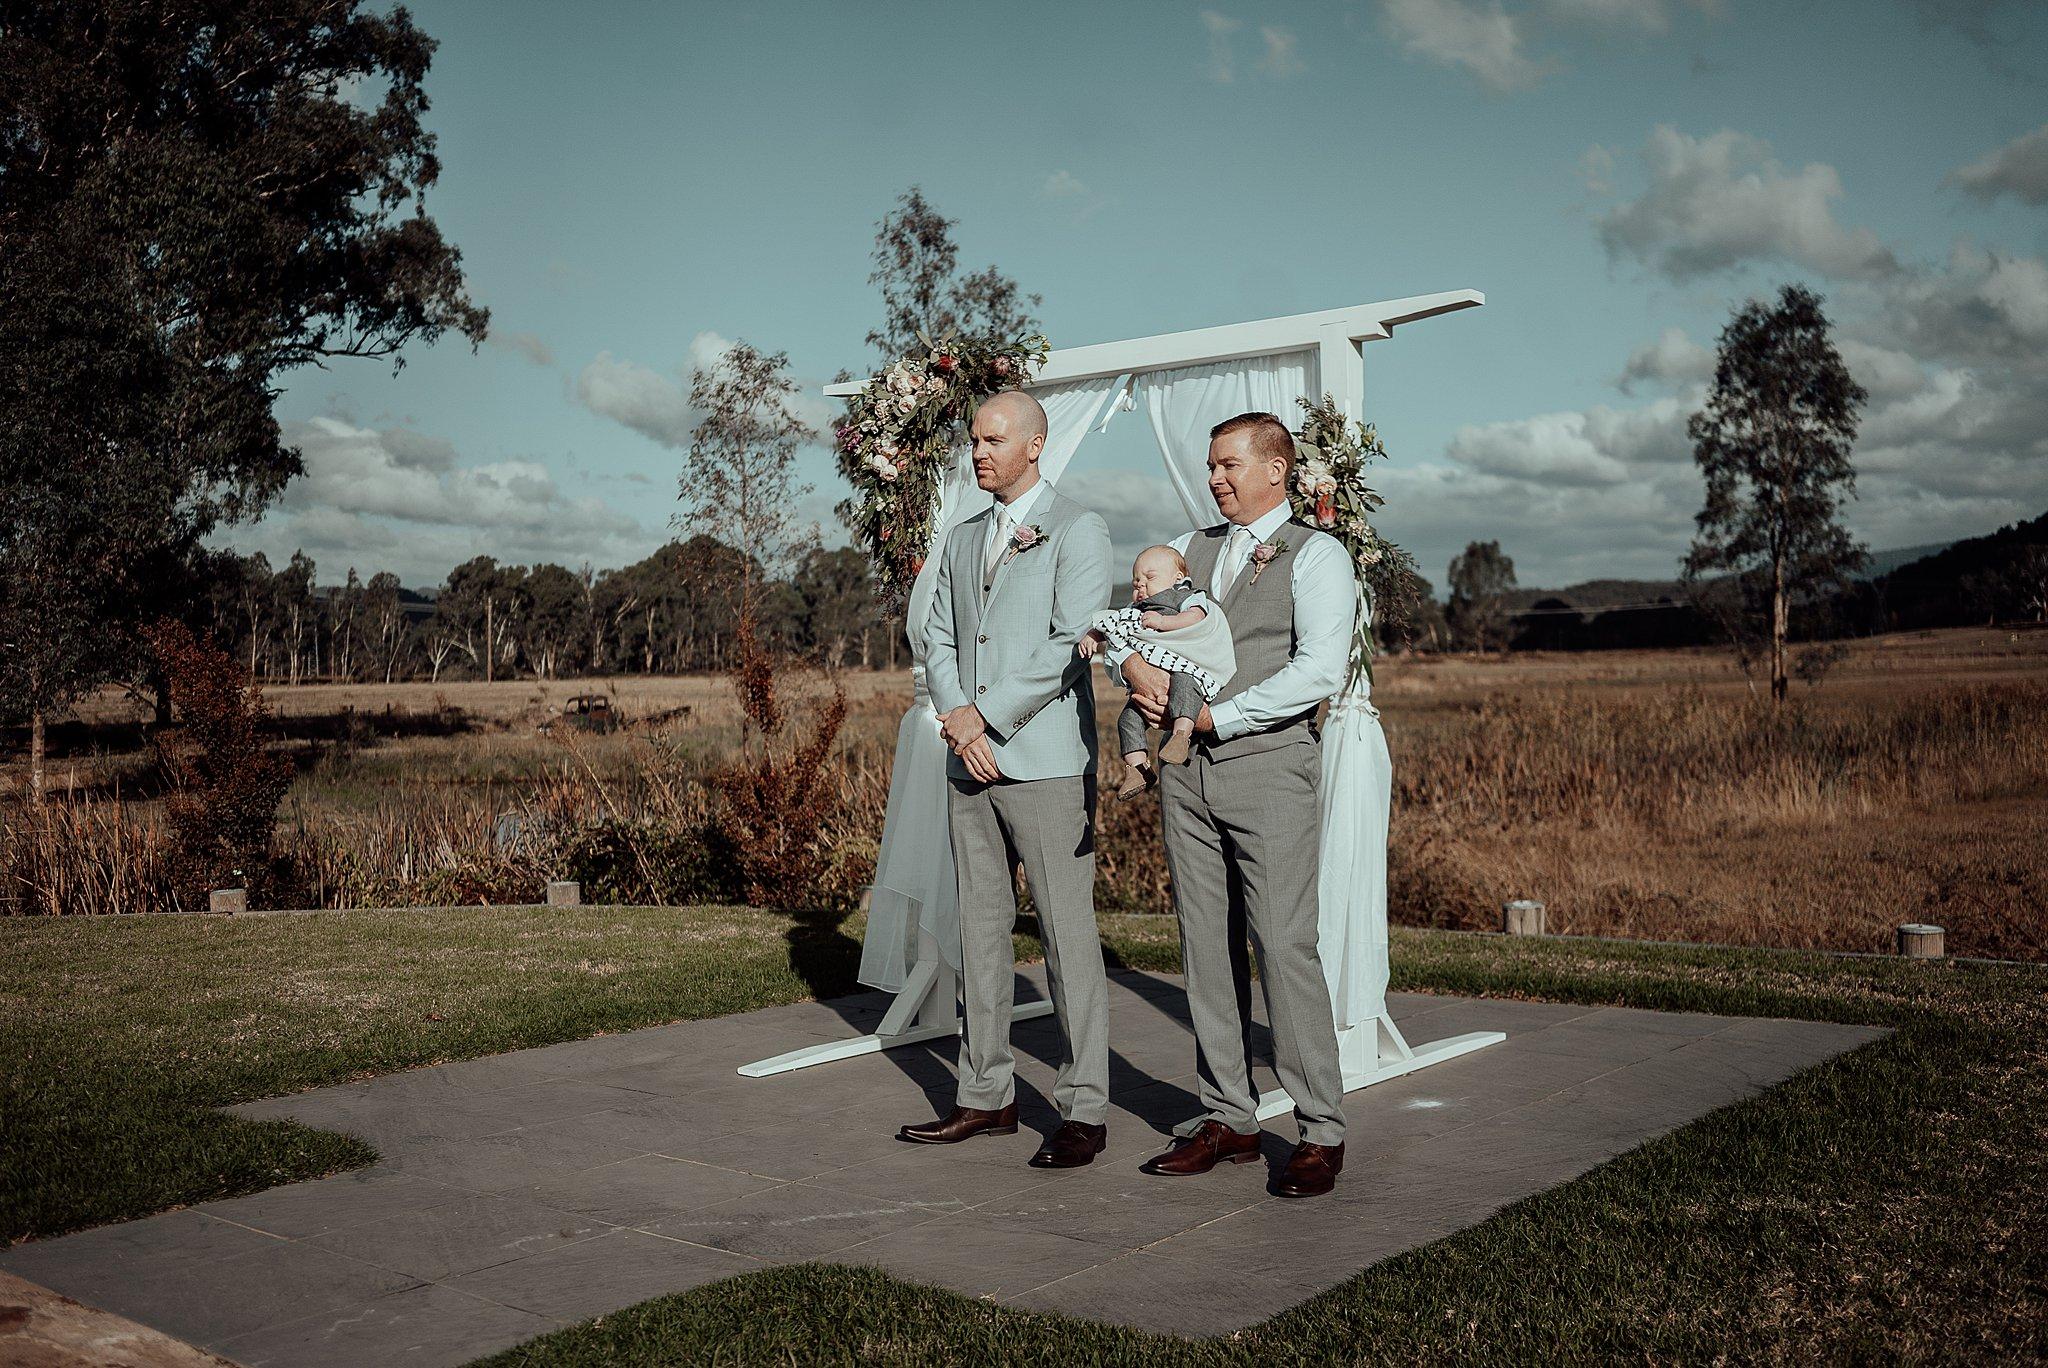 mickalathomas_puremacphotography_weddingphotographer_couplephotographer_Sheppartonphotographer_3421.jpg